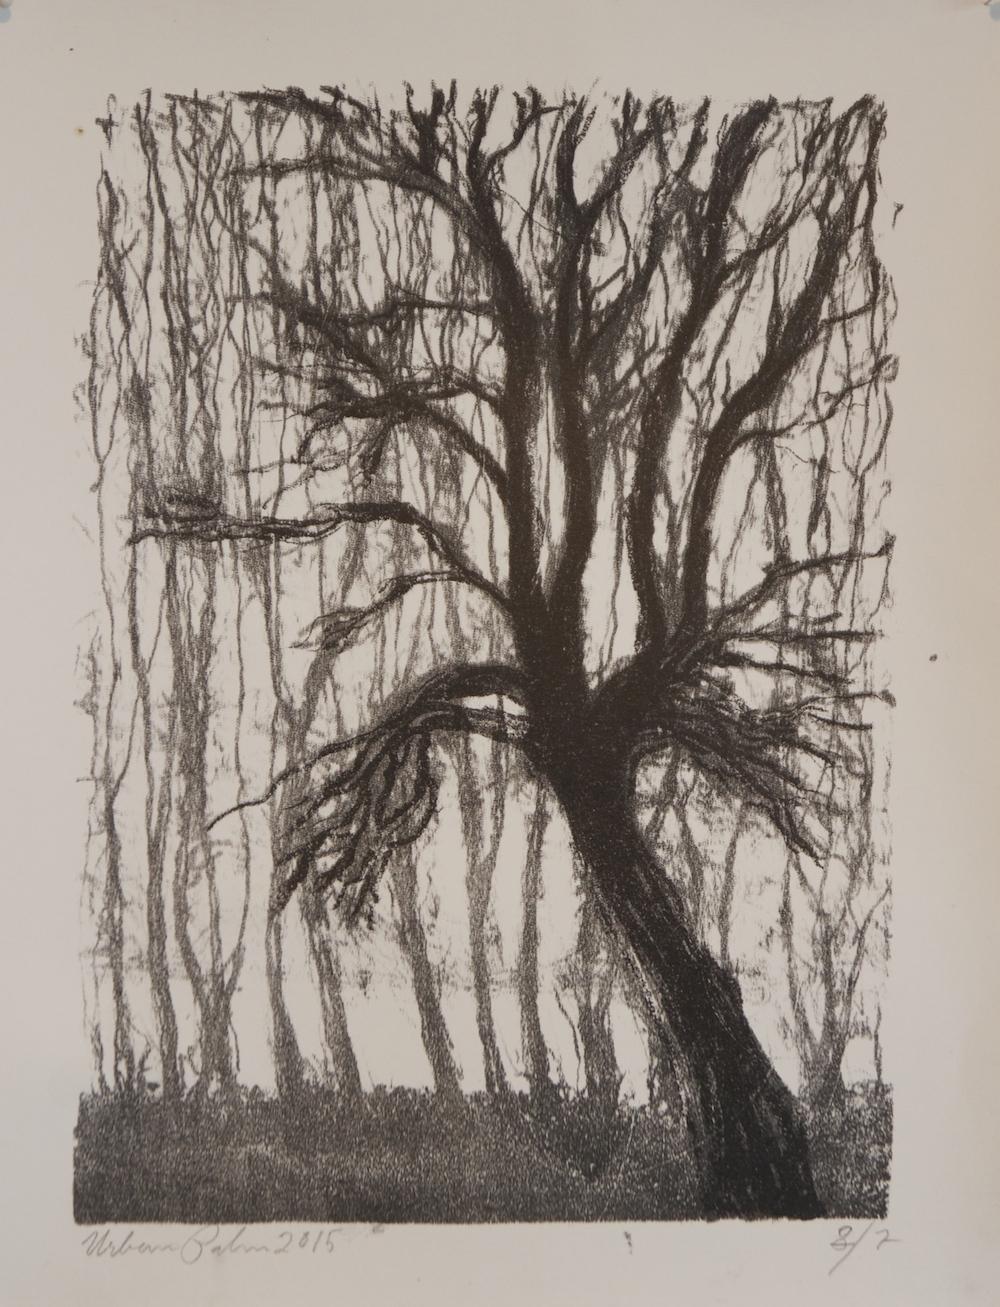 Urban Palm, litografi 2015